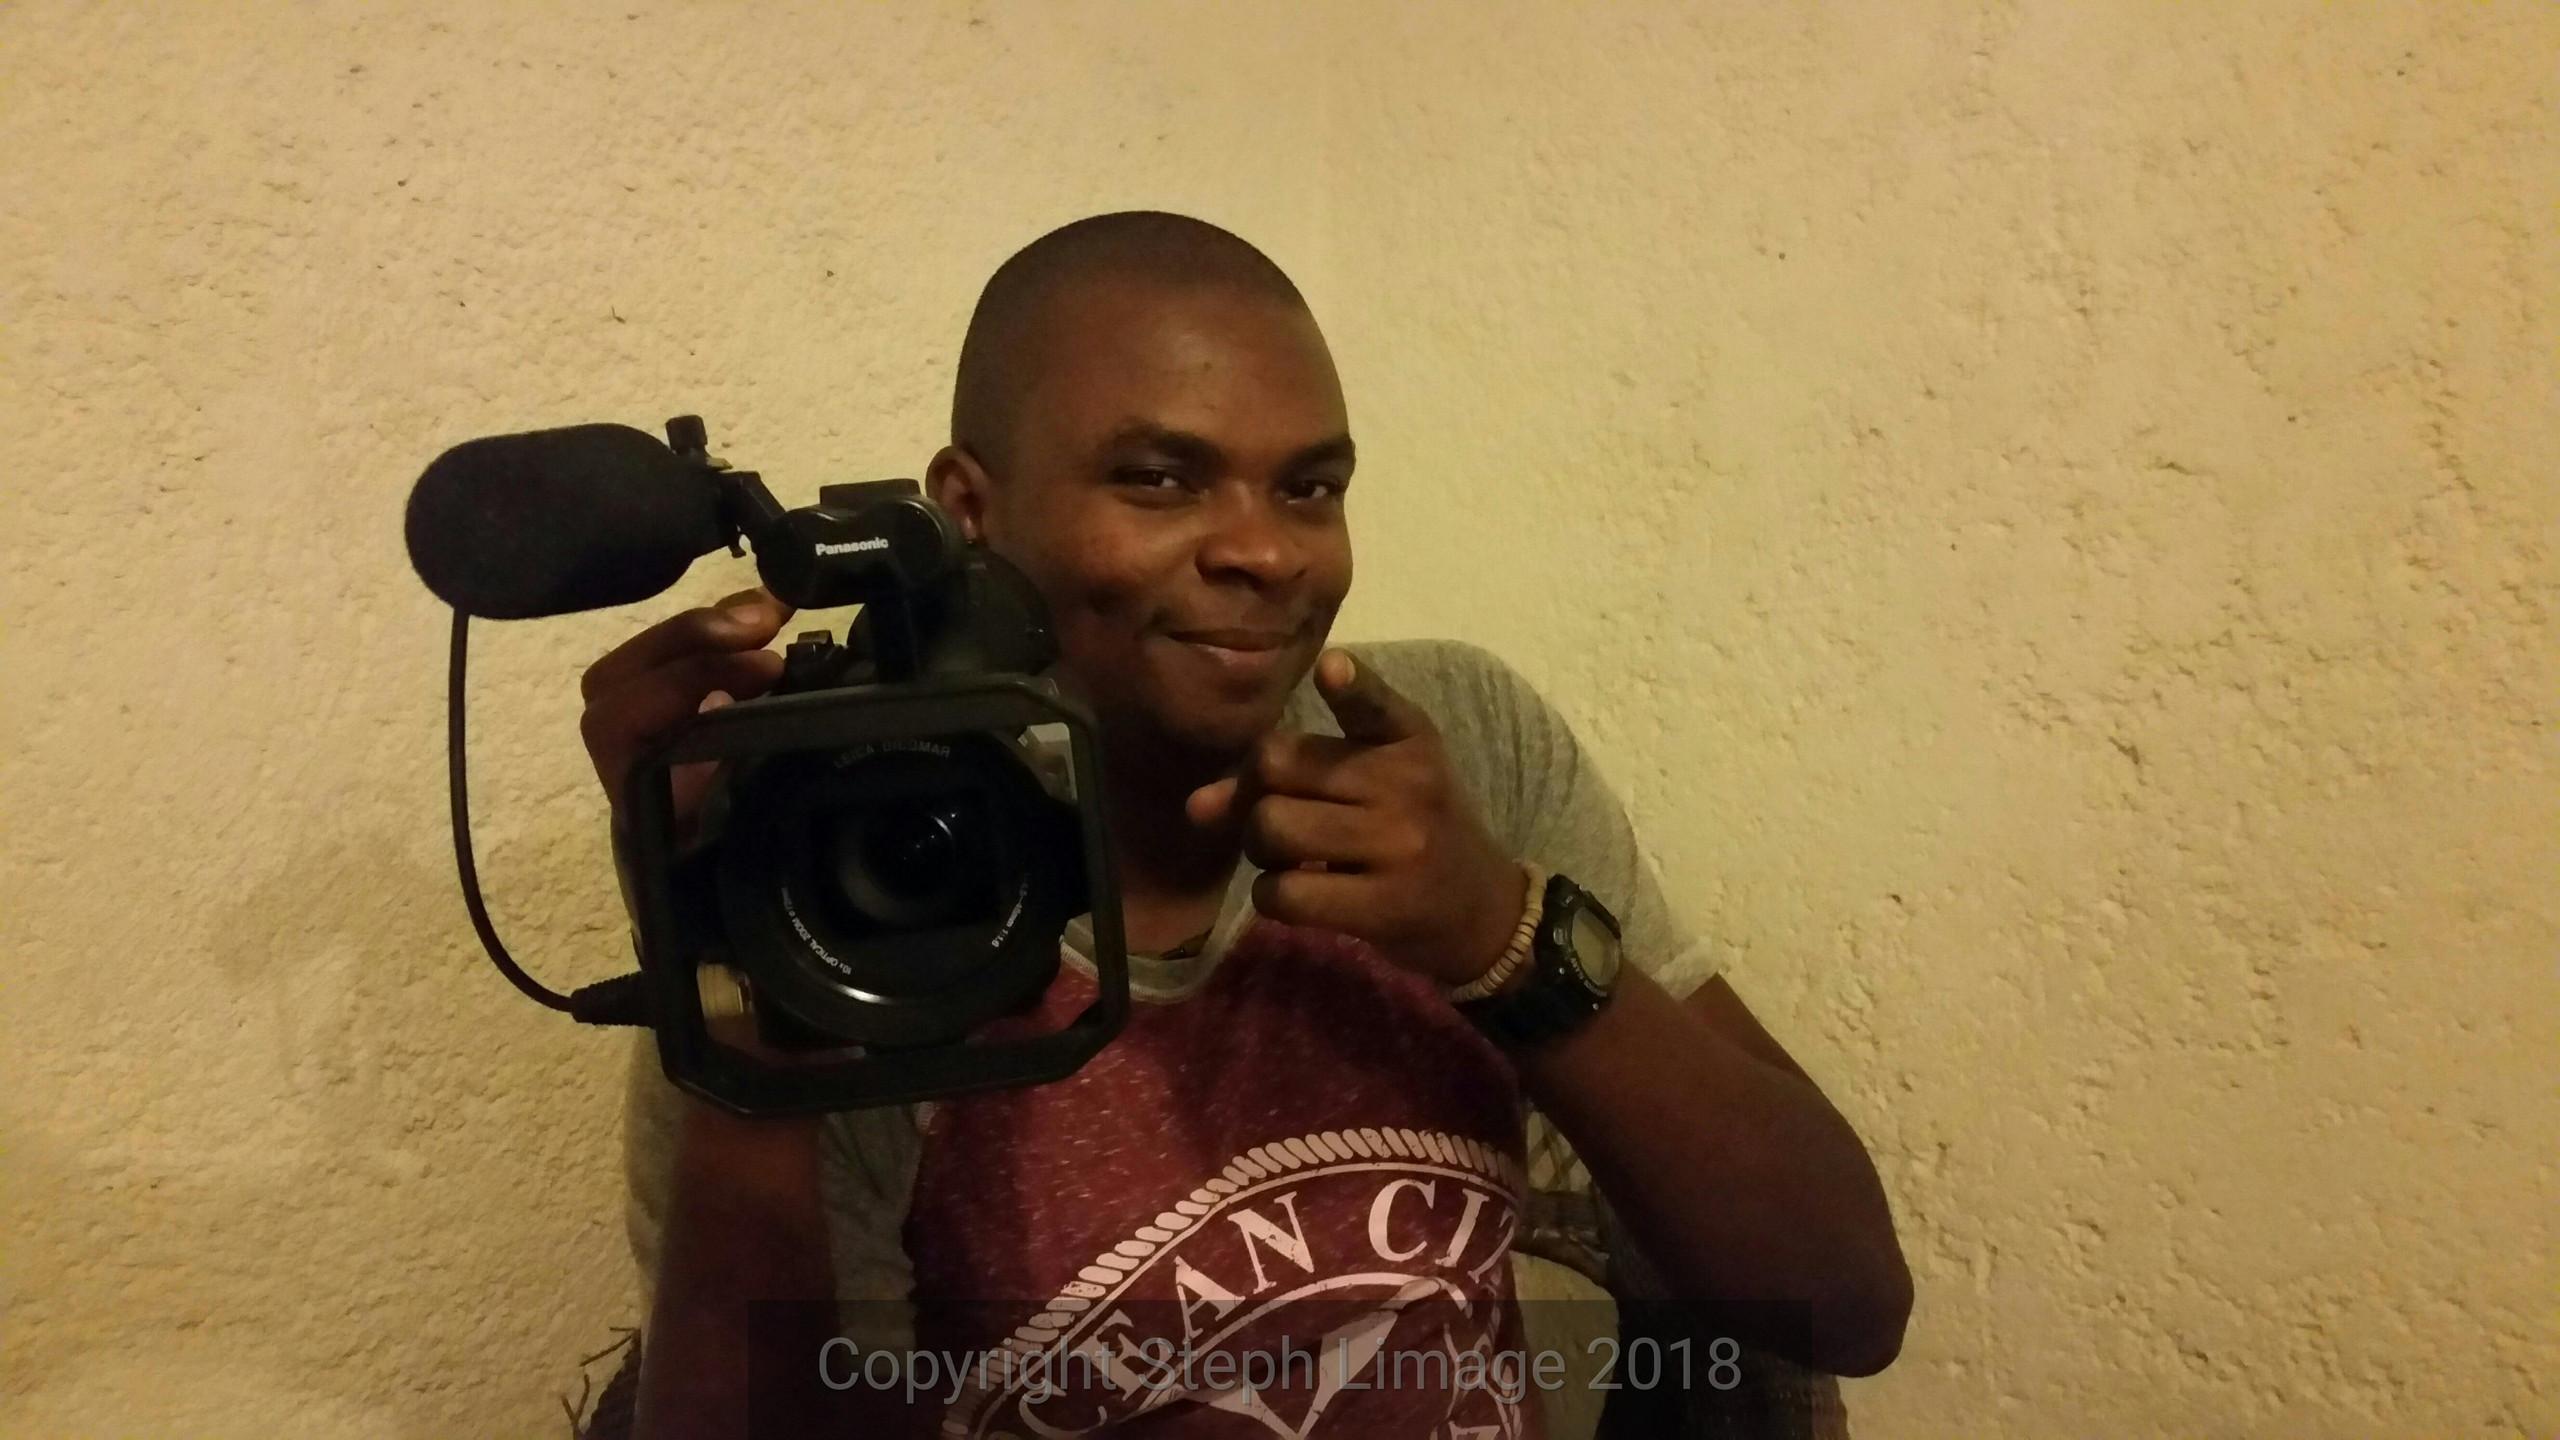 Copyright Limage Media